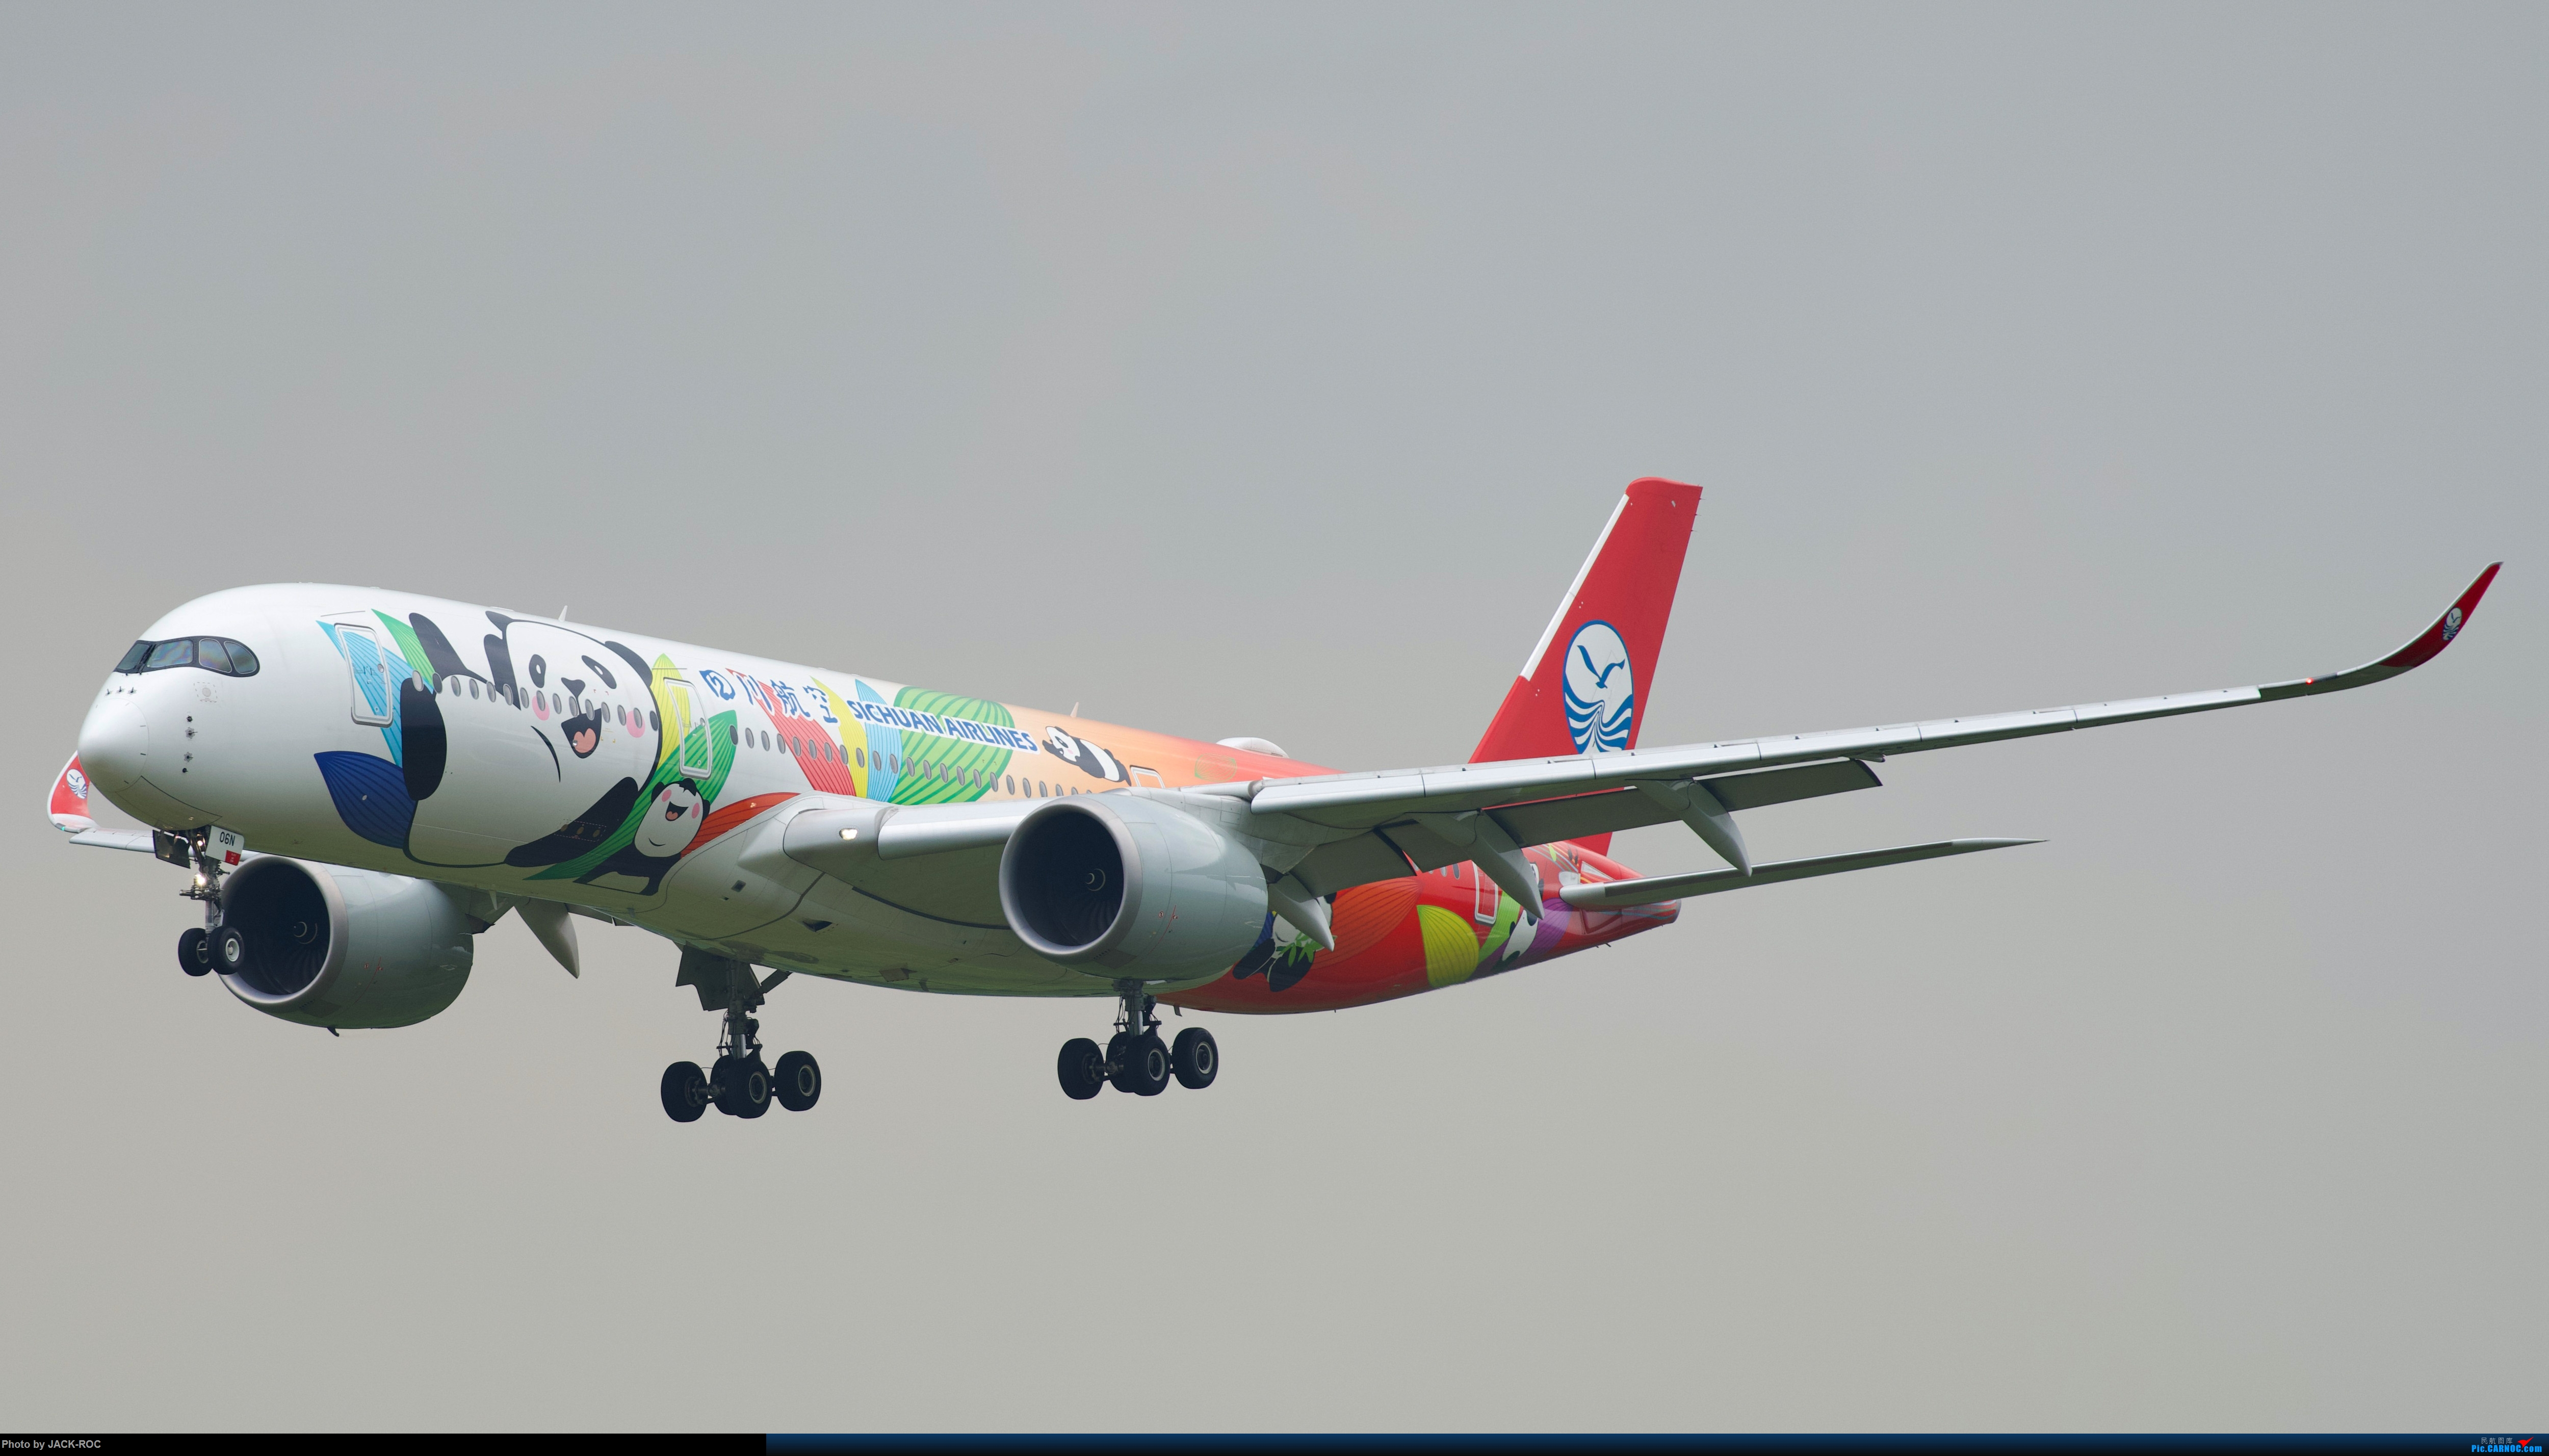 Re:[原创]CTU 9月14日 今天运气好,逮到了几个宝贝 AIRBUS A350-900 B-306N 中国成都双流国际机场